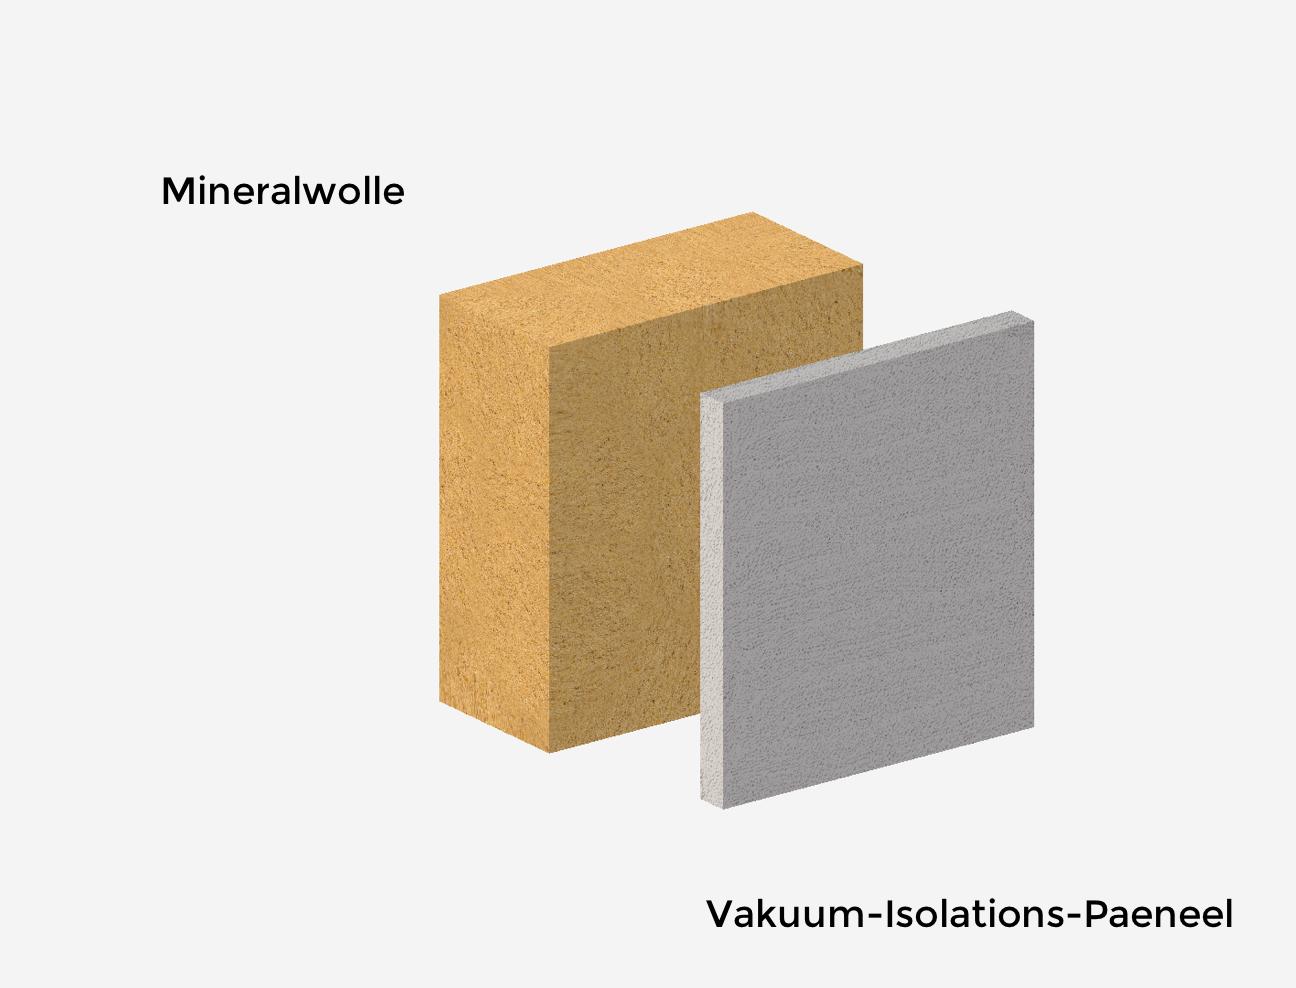 Kühlschrank Dämmung Aufbau : Vip vaku isotherm